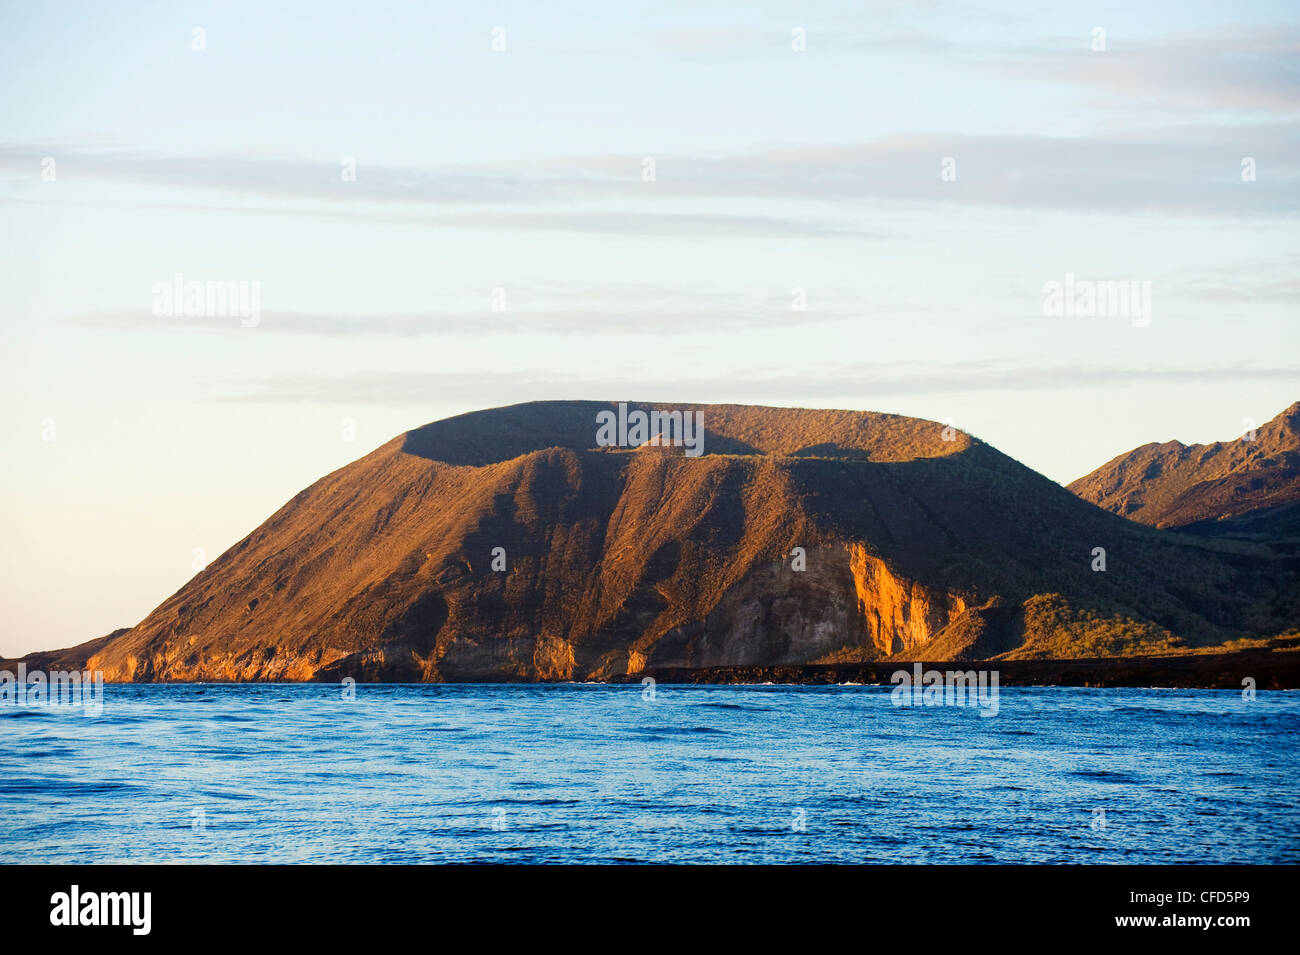 Volcanic crater island, Galapagos Islands, UNESCO World Heritage Site, Ecuador, South America - Stock Image